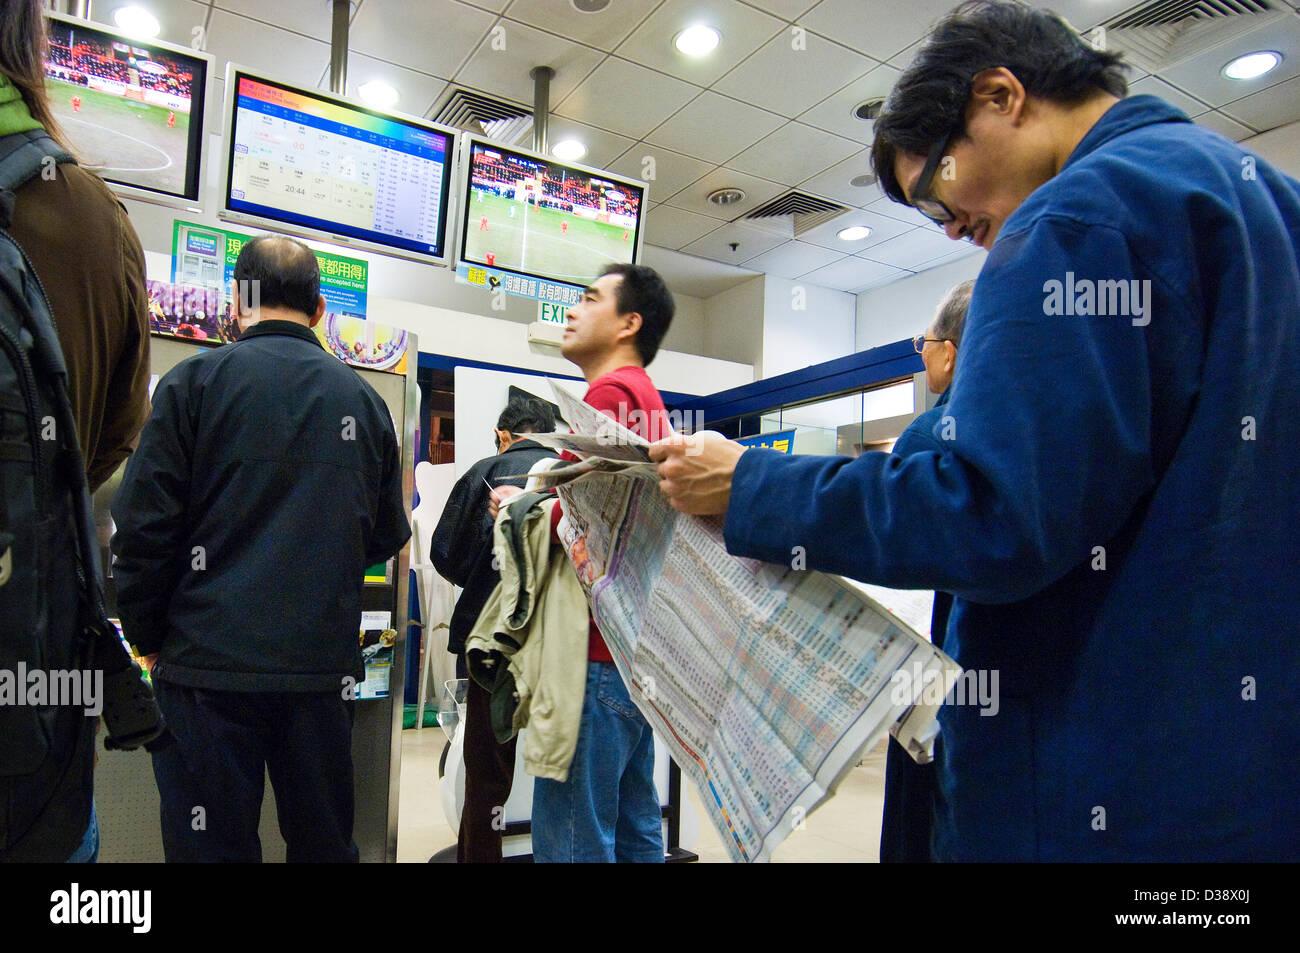 Gamblers in Hong Kong bet on English and European football and soccer games at a betting shop run by the Hong Kong - Stock Image